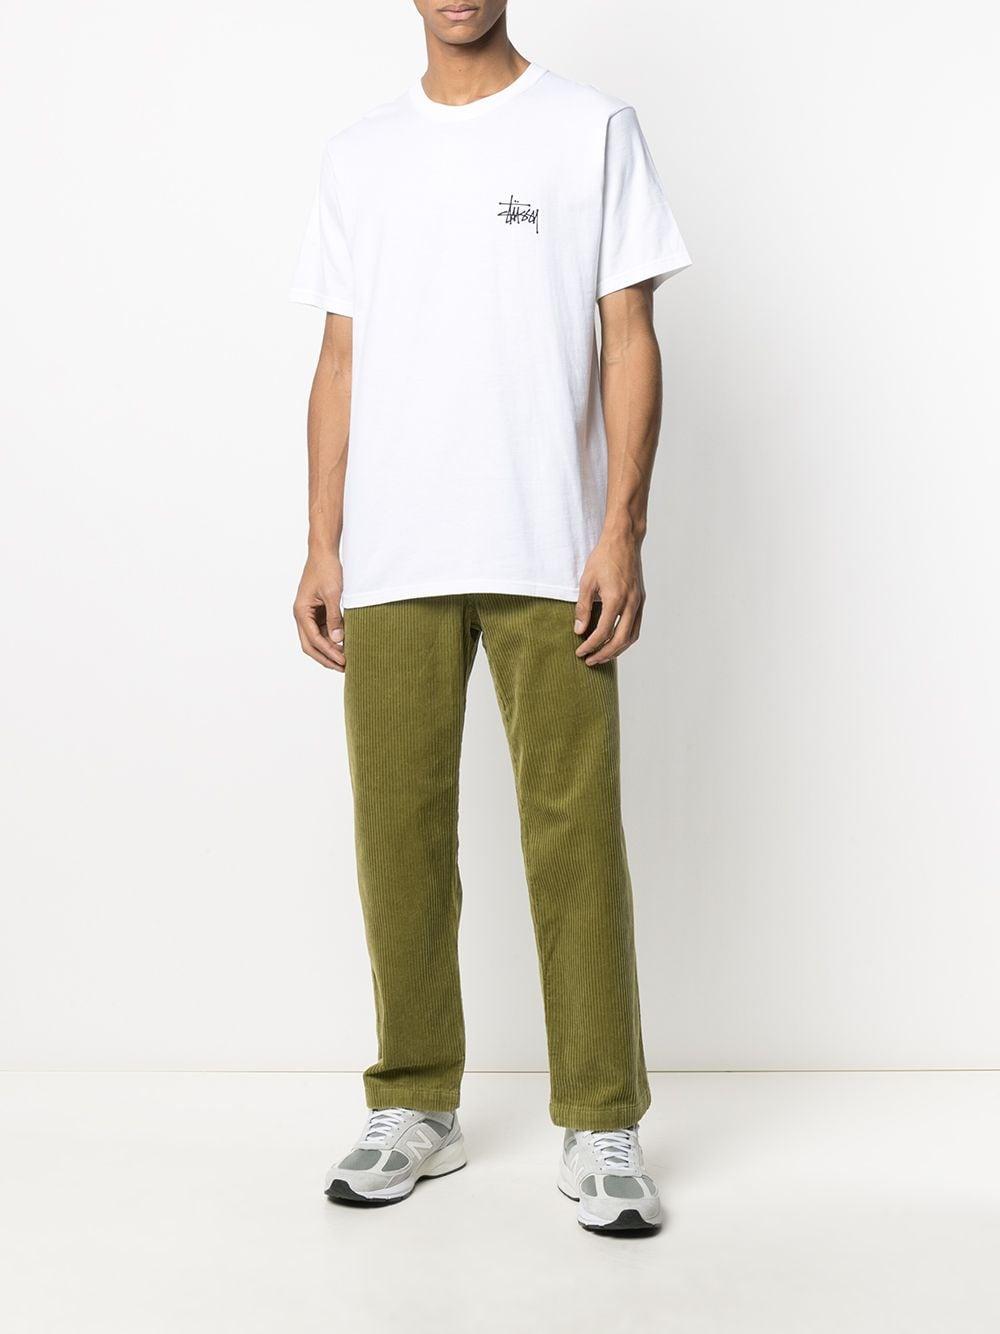 T-SHIRT CON LOGO STUSSY   T-shirt   1904615WHITE